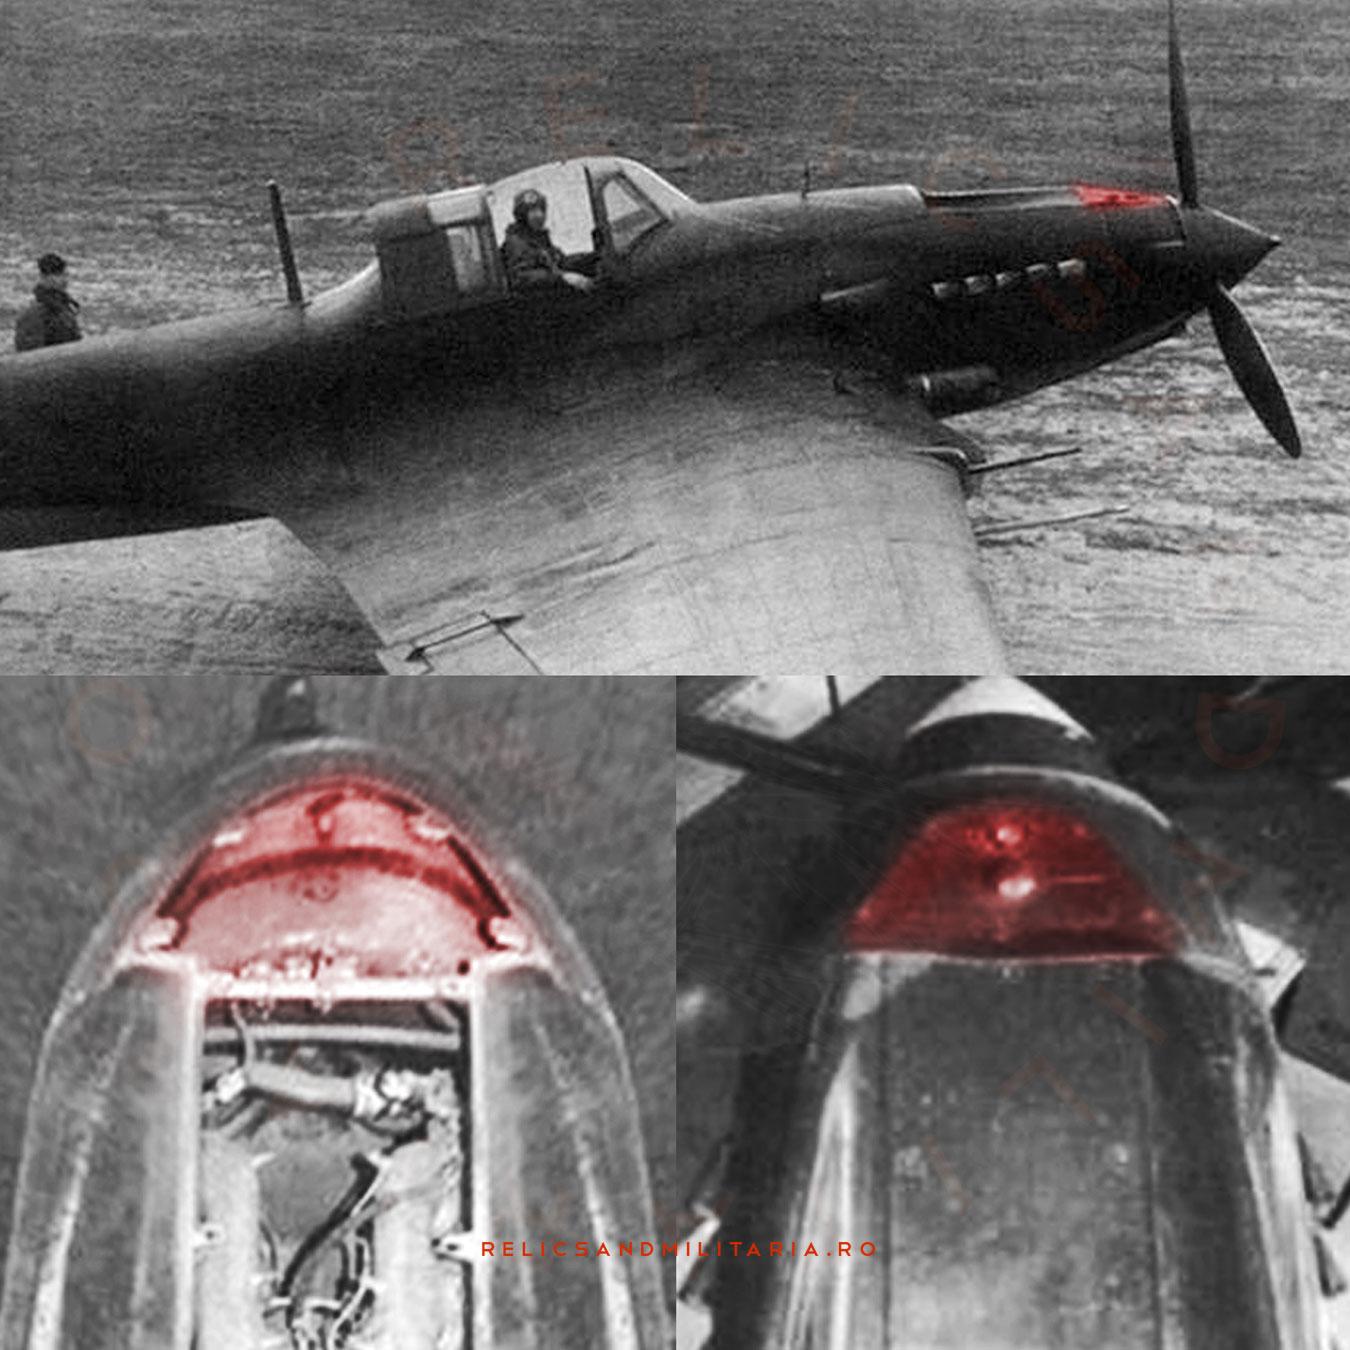 Ilyushin Il-2 Shturmovik Russian ww2 groung attack plane